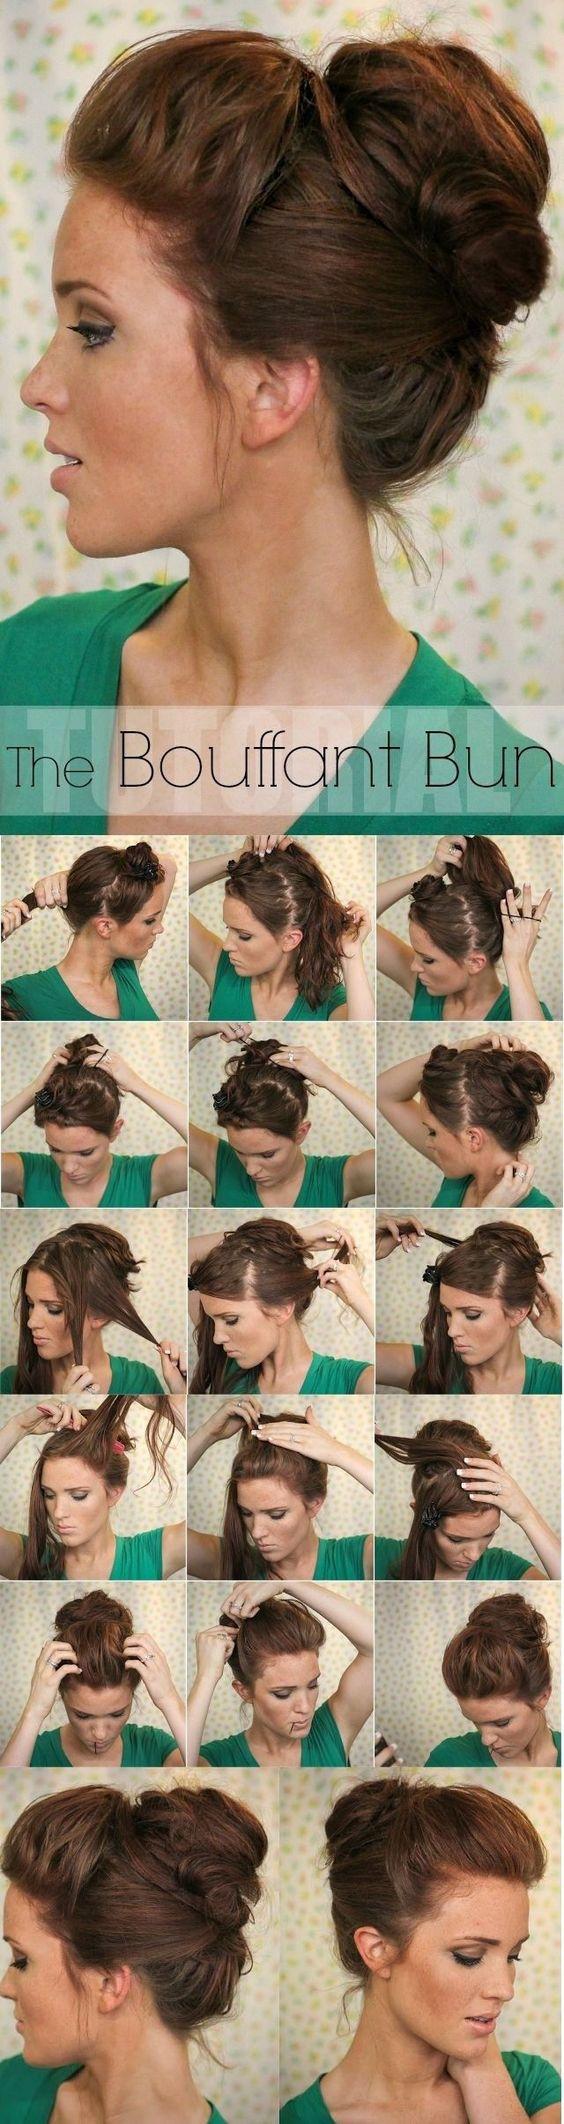 Super Easy Updo Hairstyles Tutorials: Bouffant Bun: